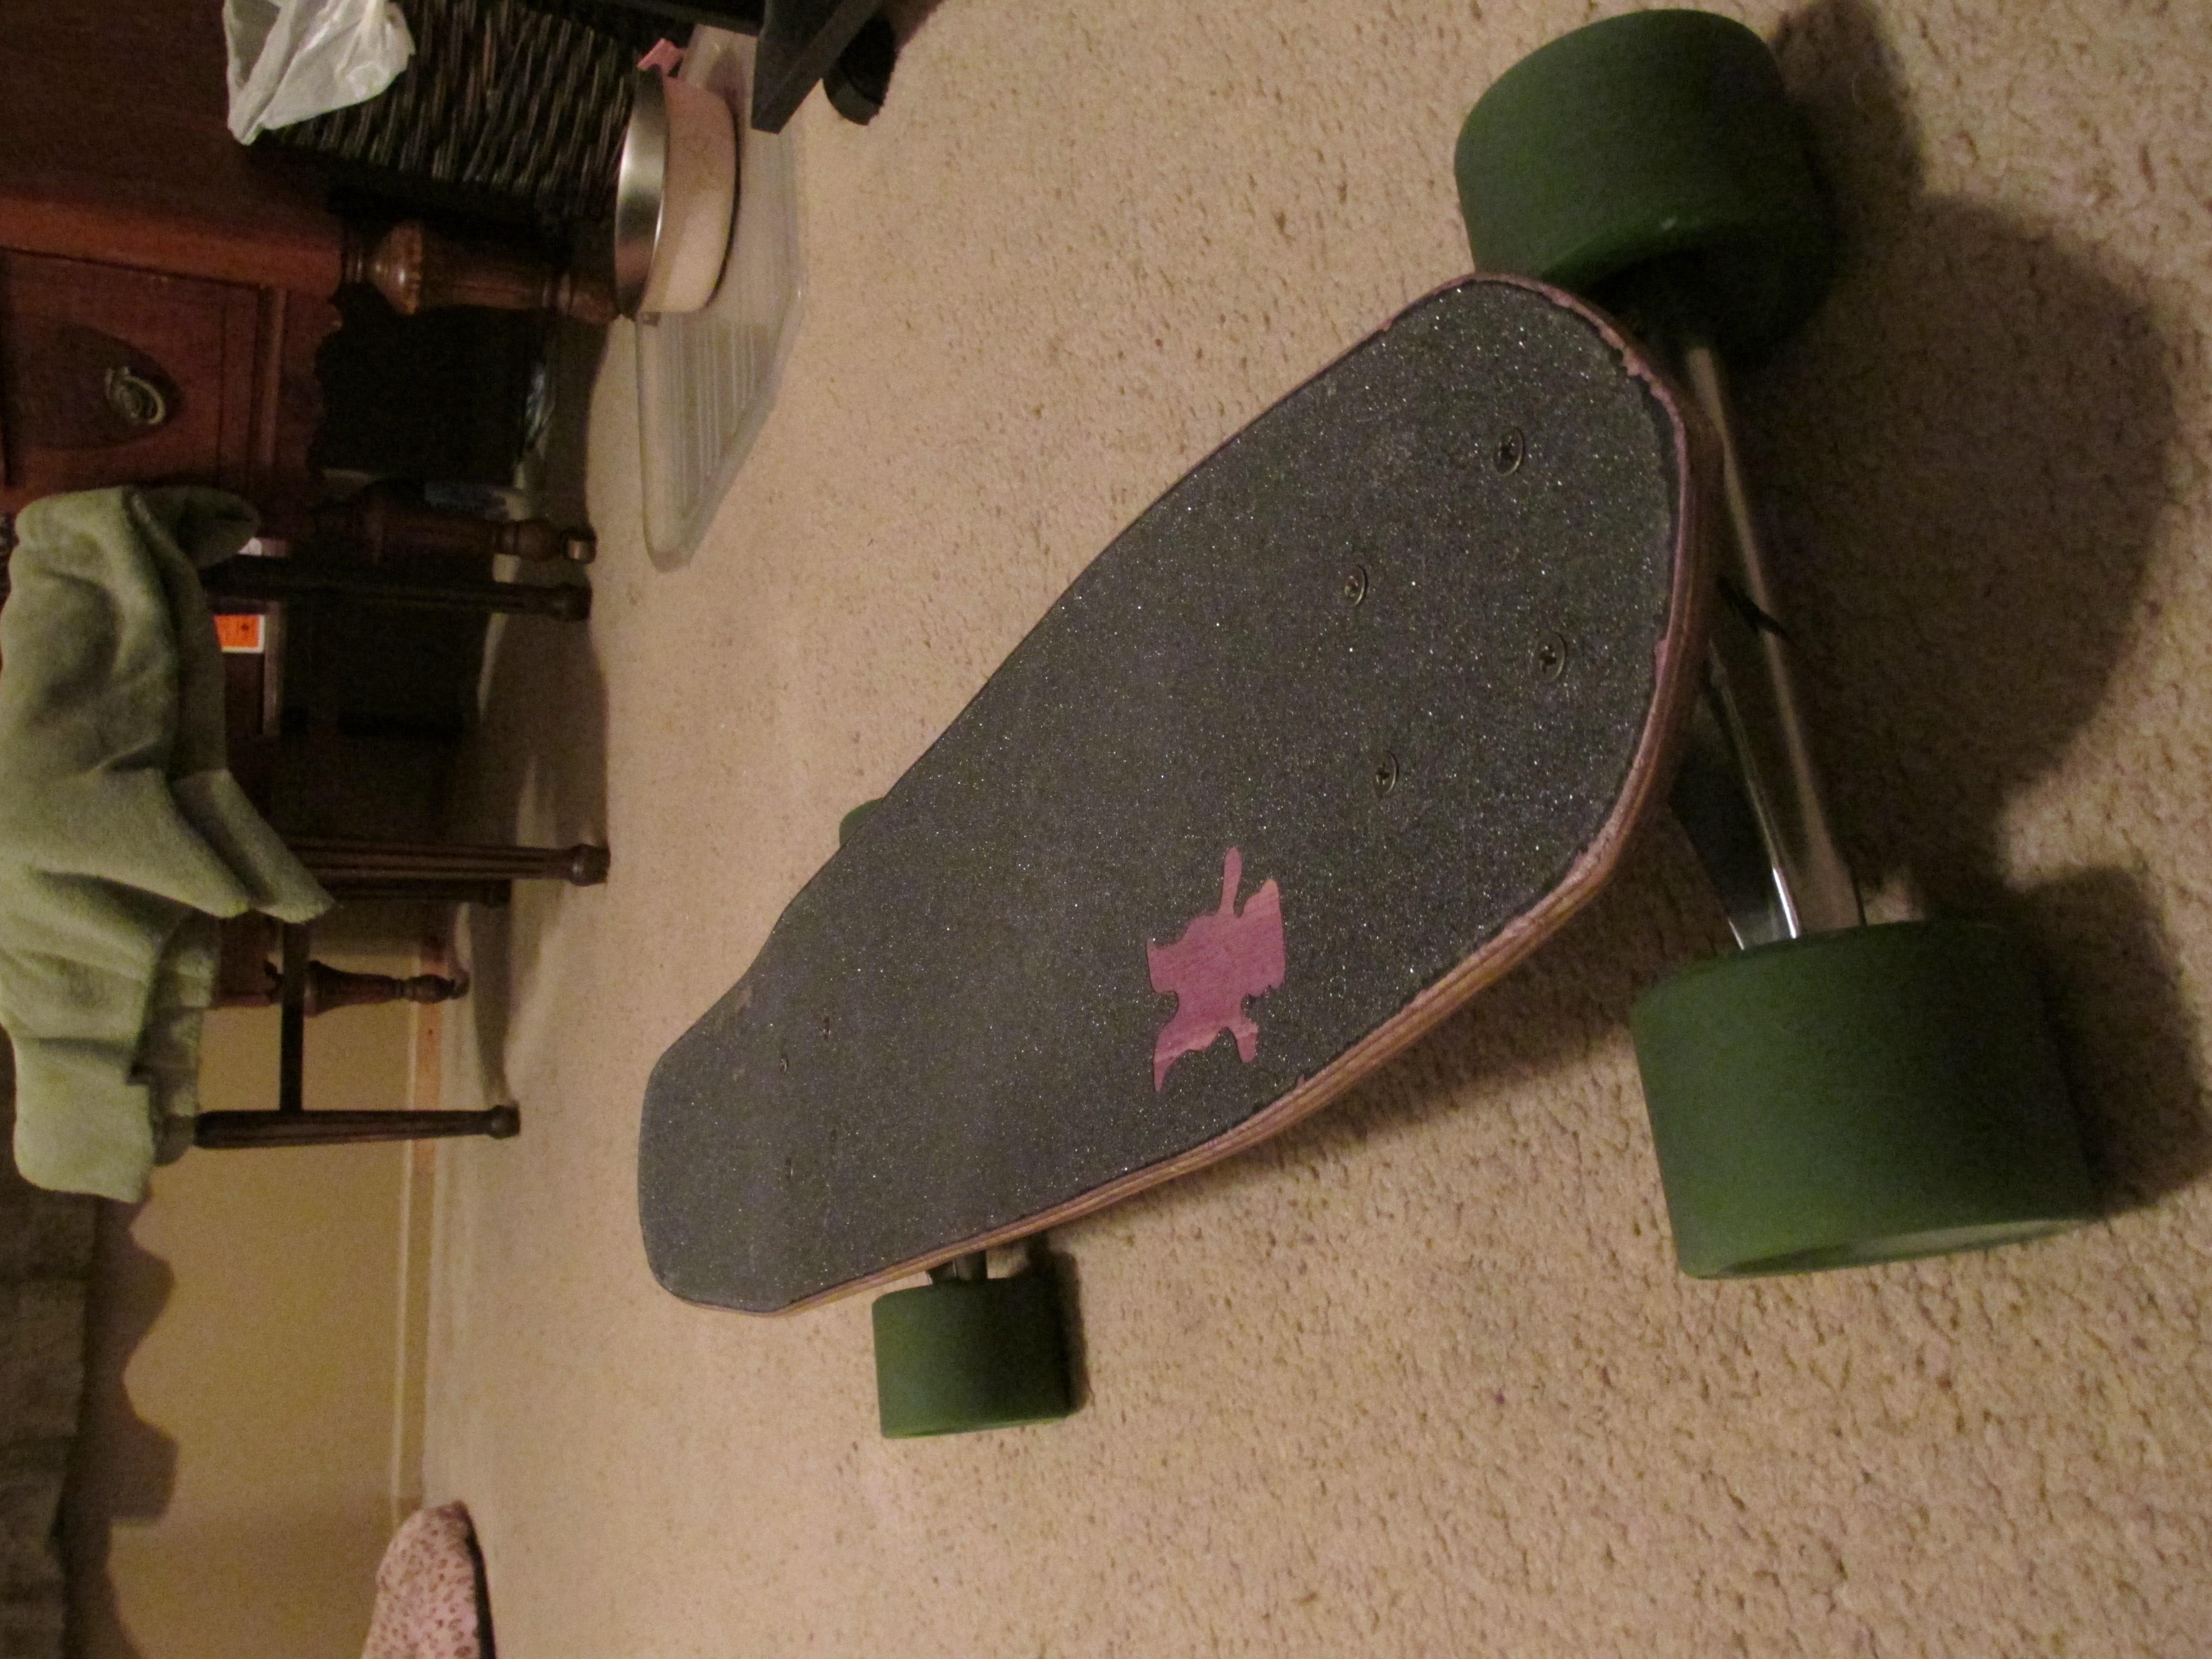 Recycled Cruising Skateboard